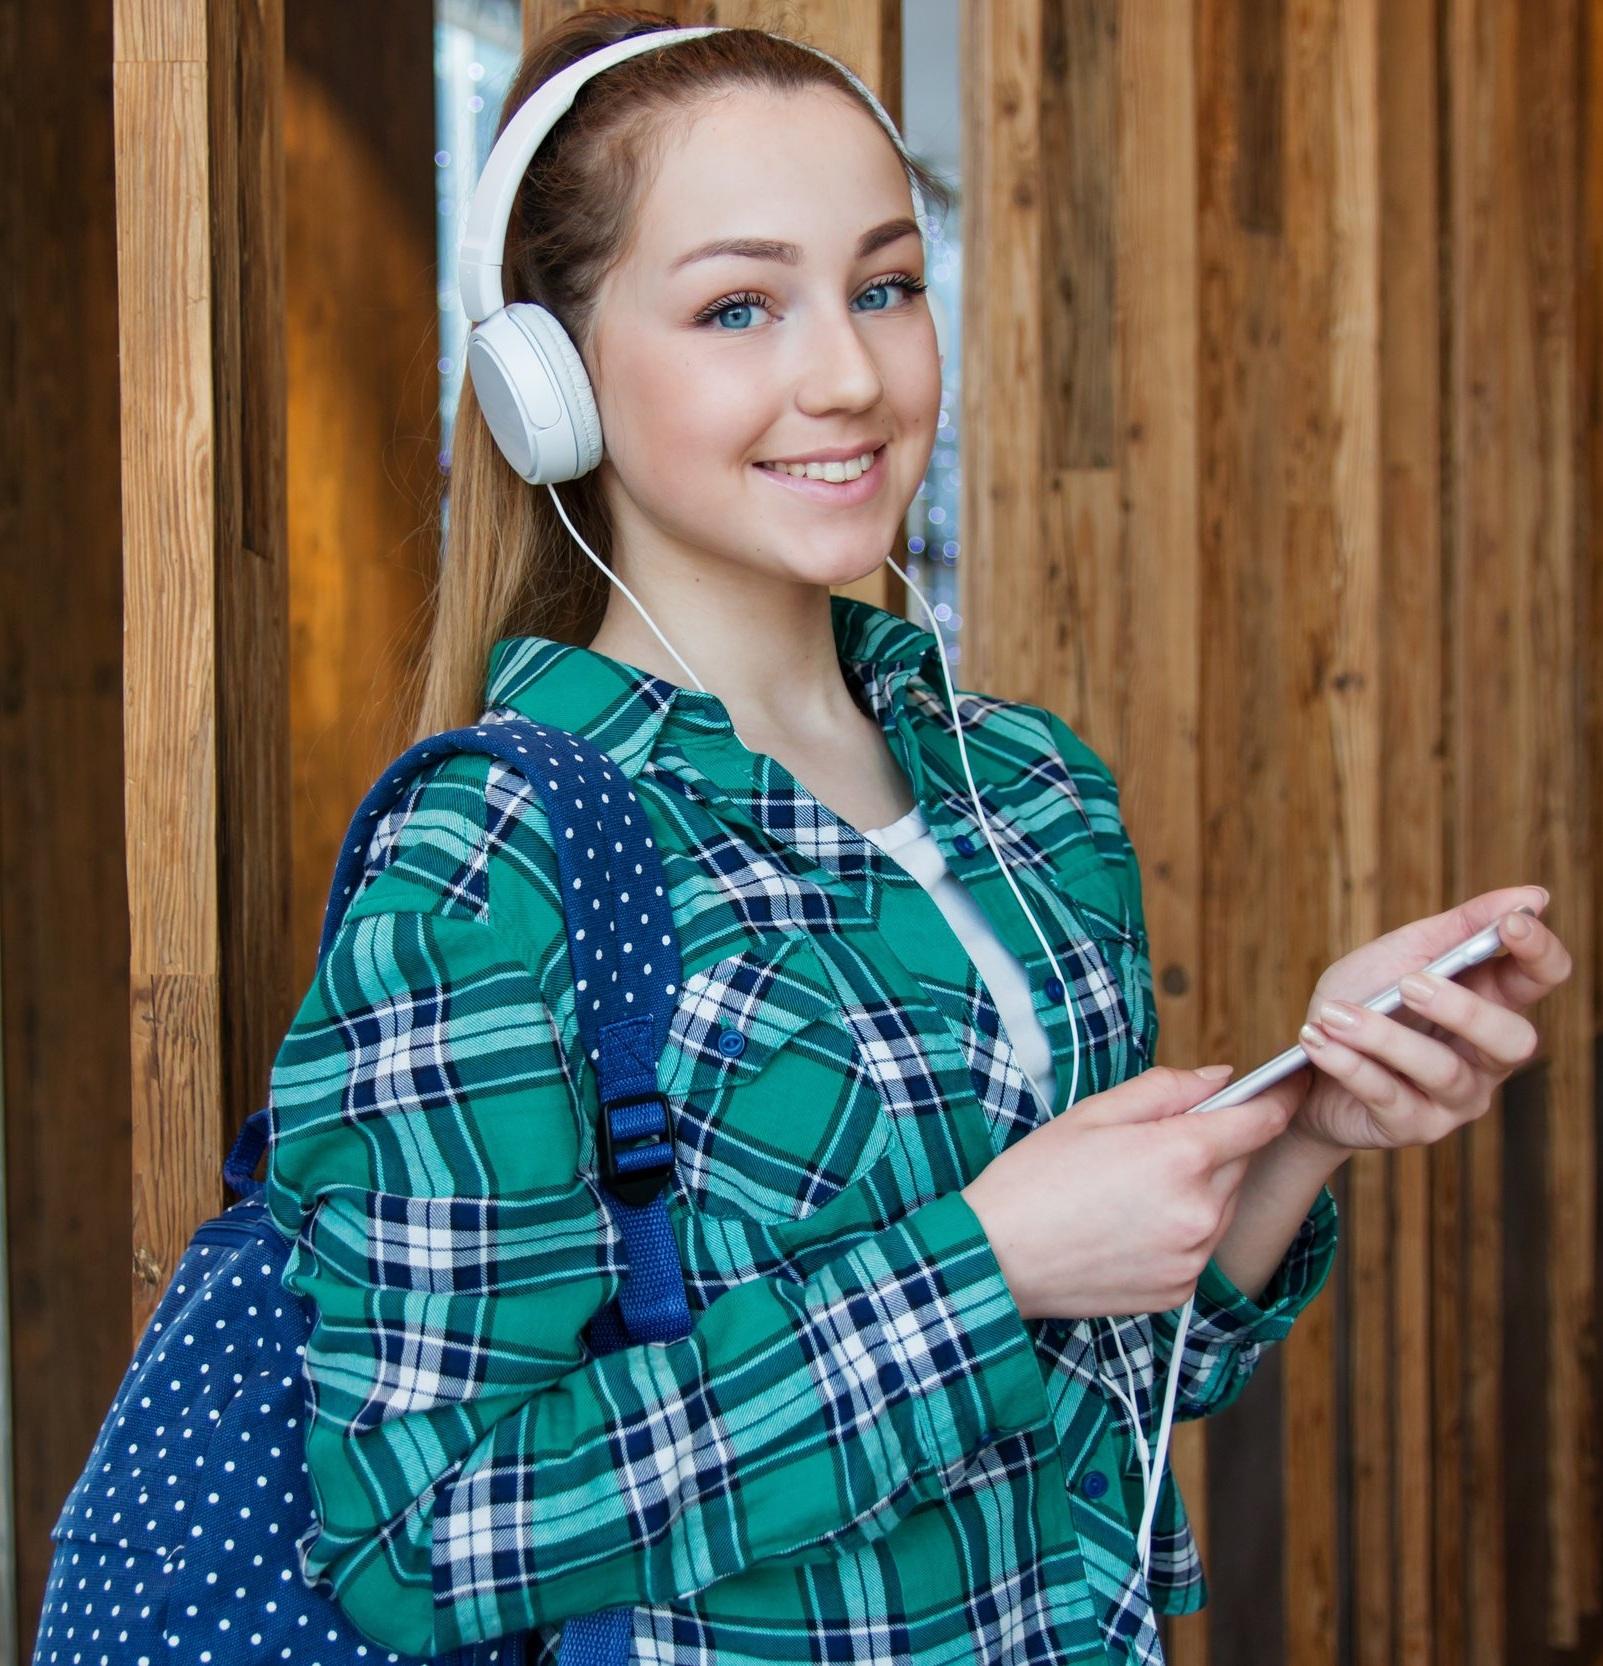 adolescent-attractive-backpack-1462633.jpg